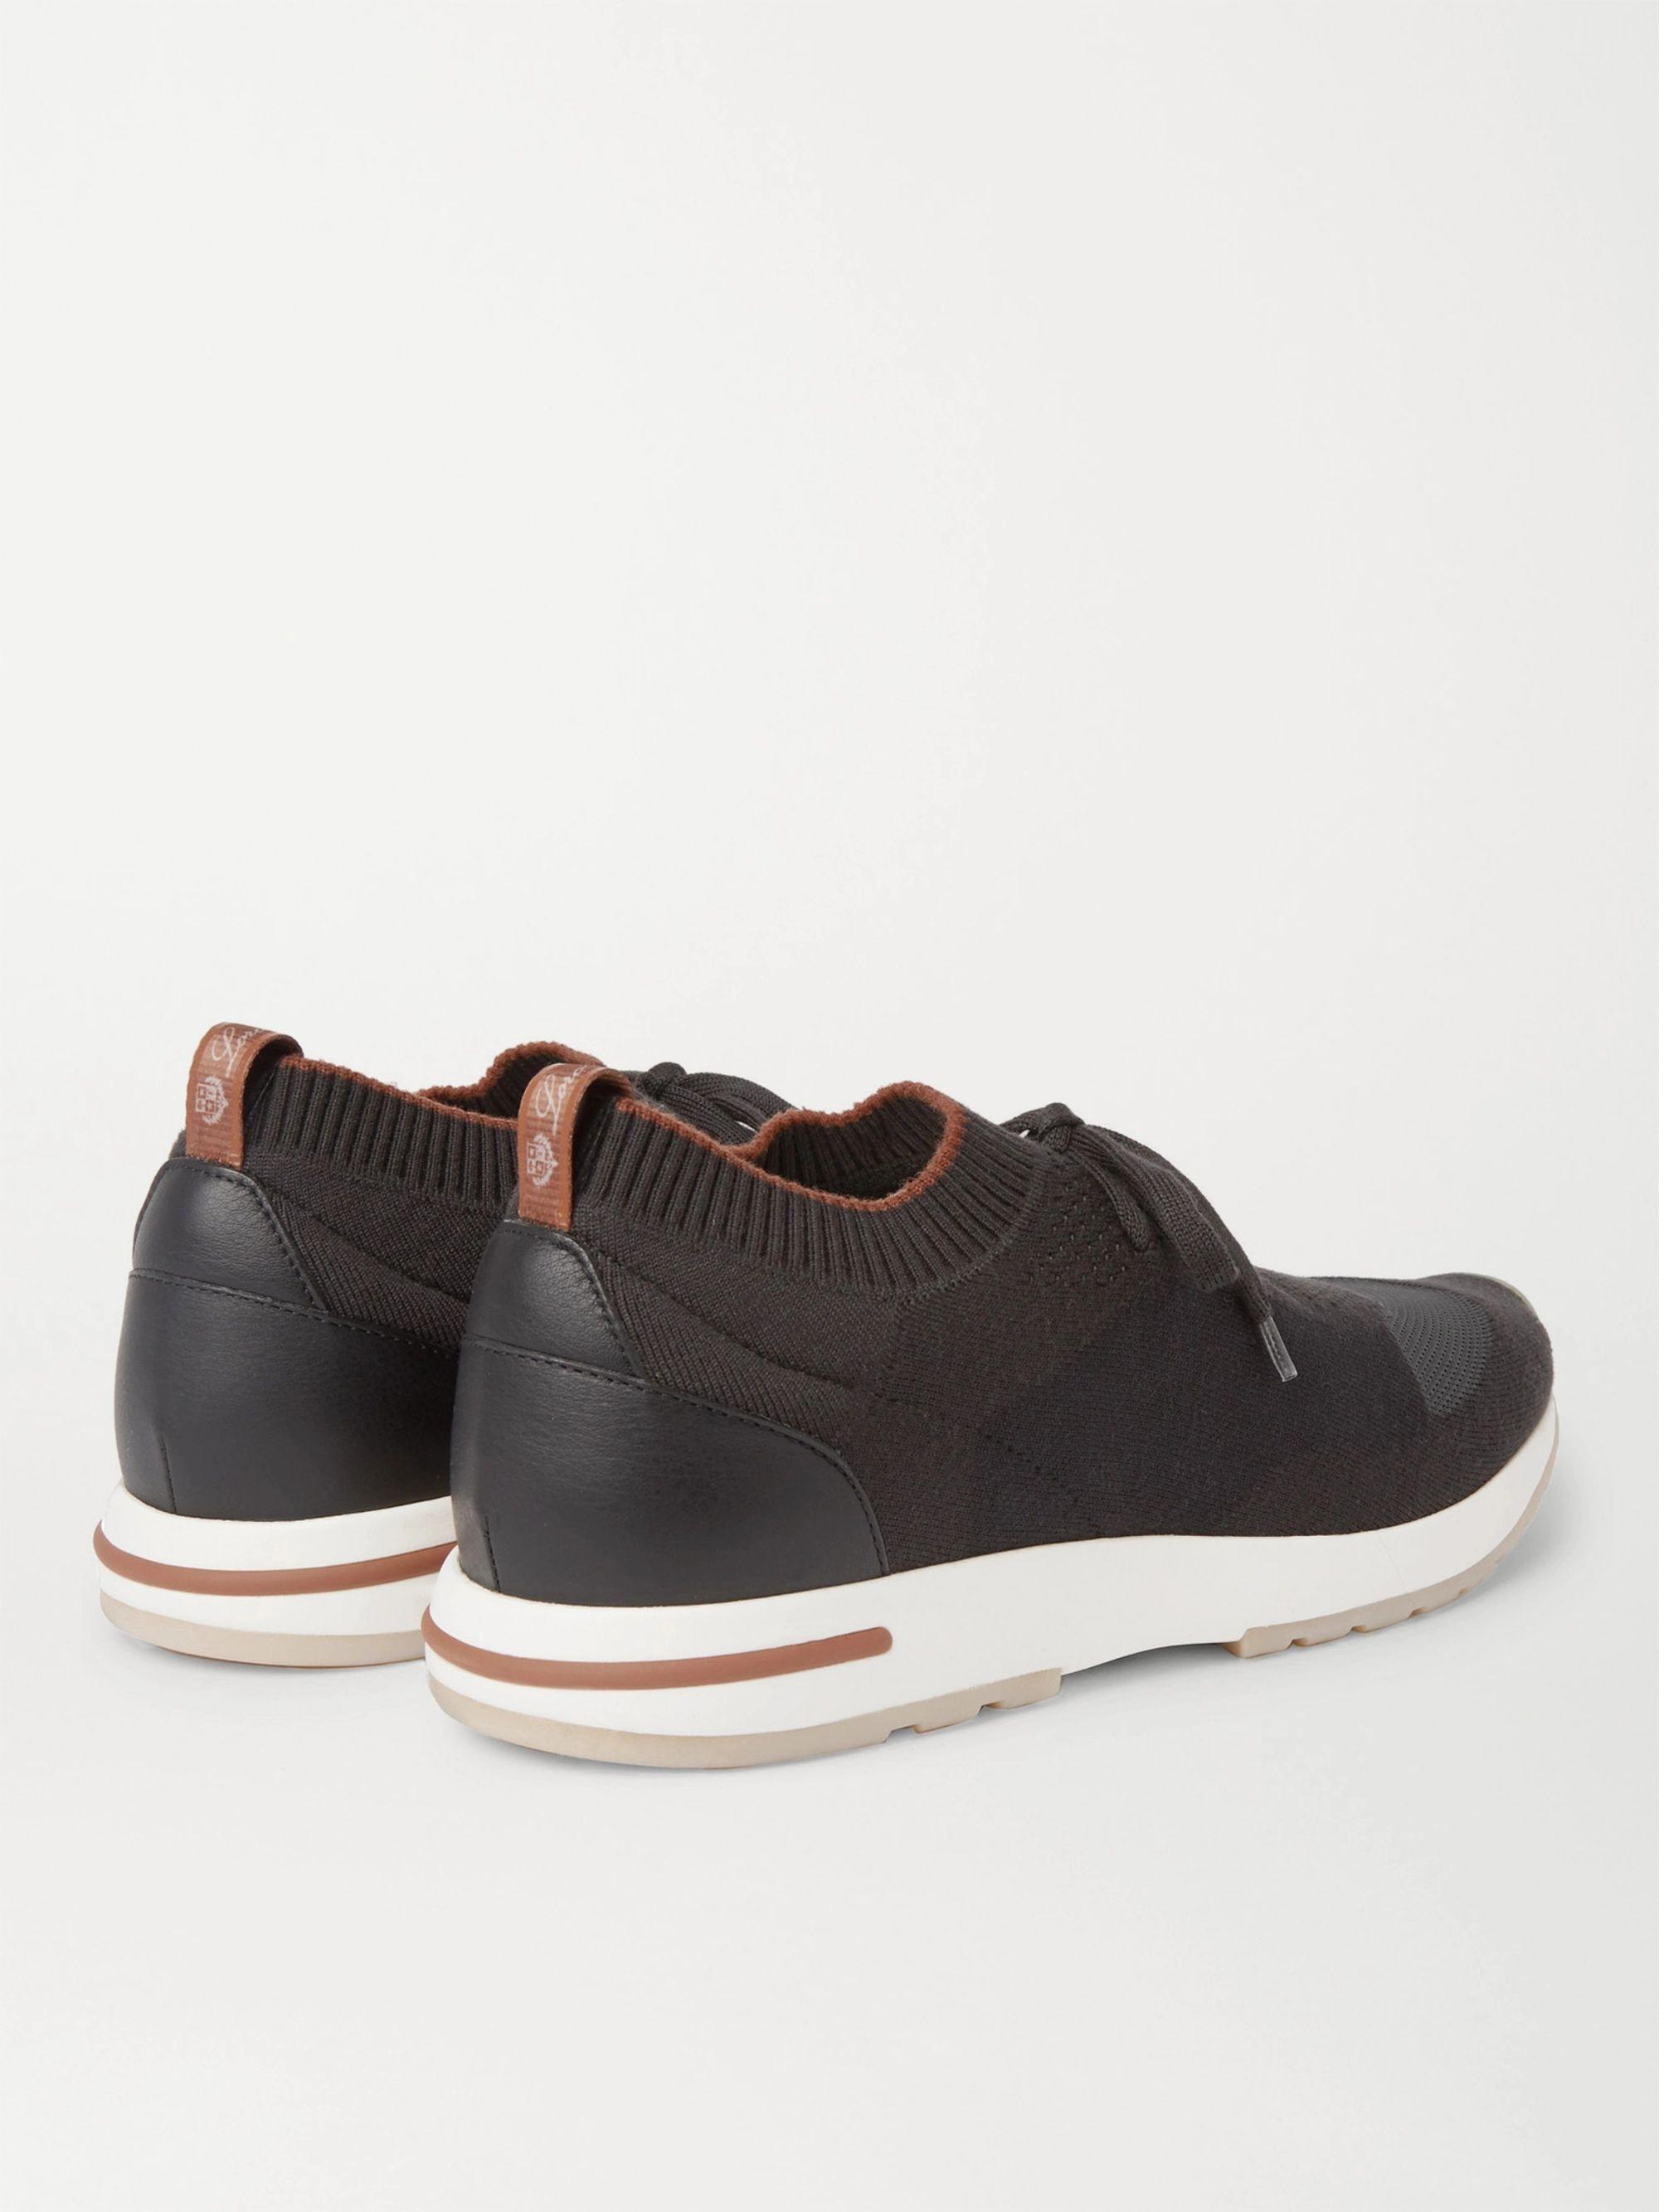 Black 360 Flexy Walk Leather-trimmed Knitted Wool Sneakers | Loro Piana